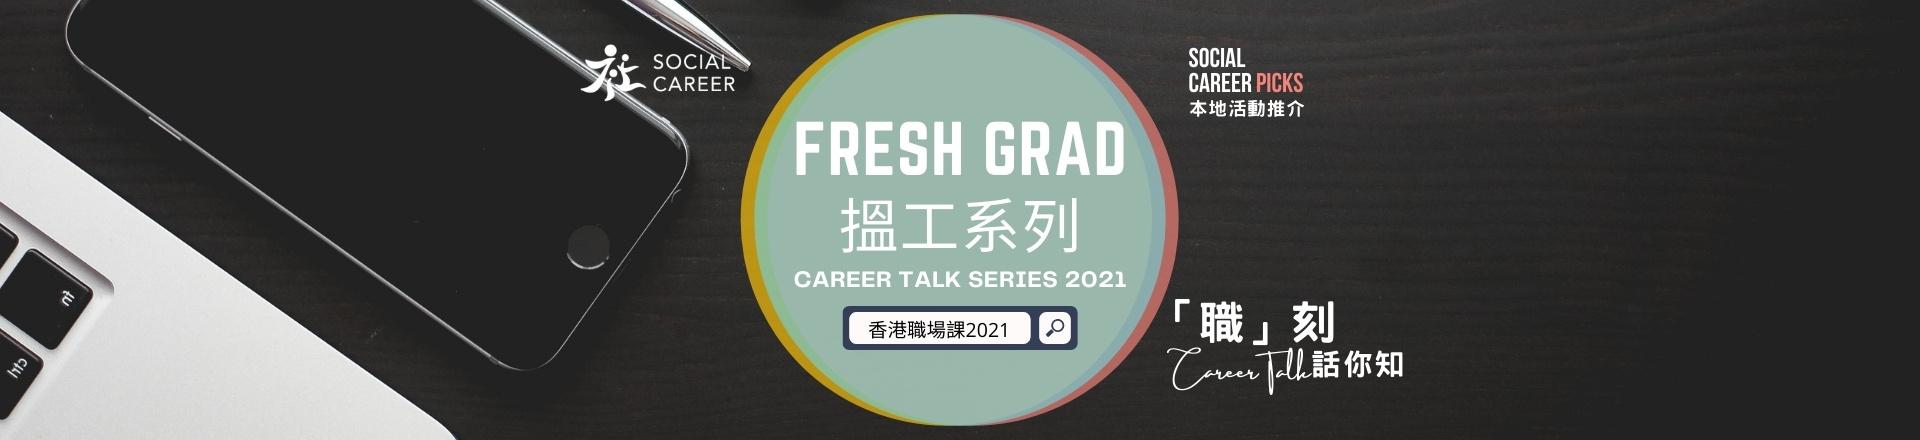 Fresh Grad 搵工 x 職場人轉工轉行系列|香港 Career Talk 2021 「疫」市求職術